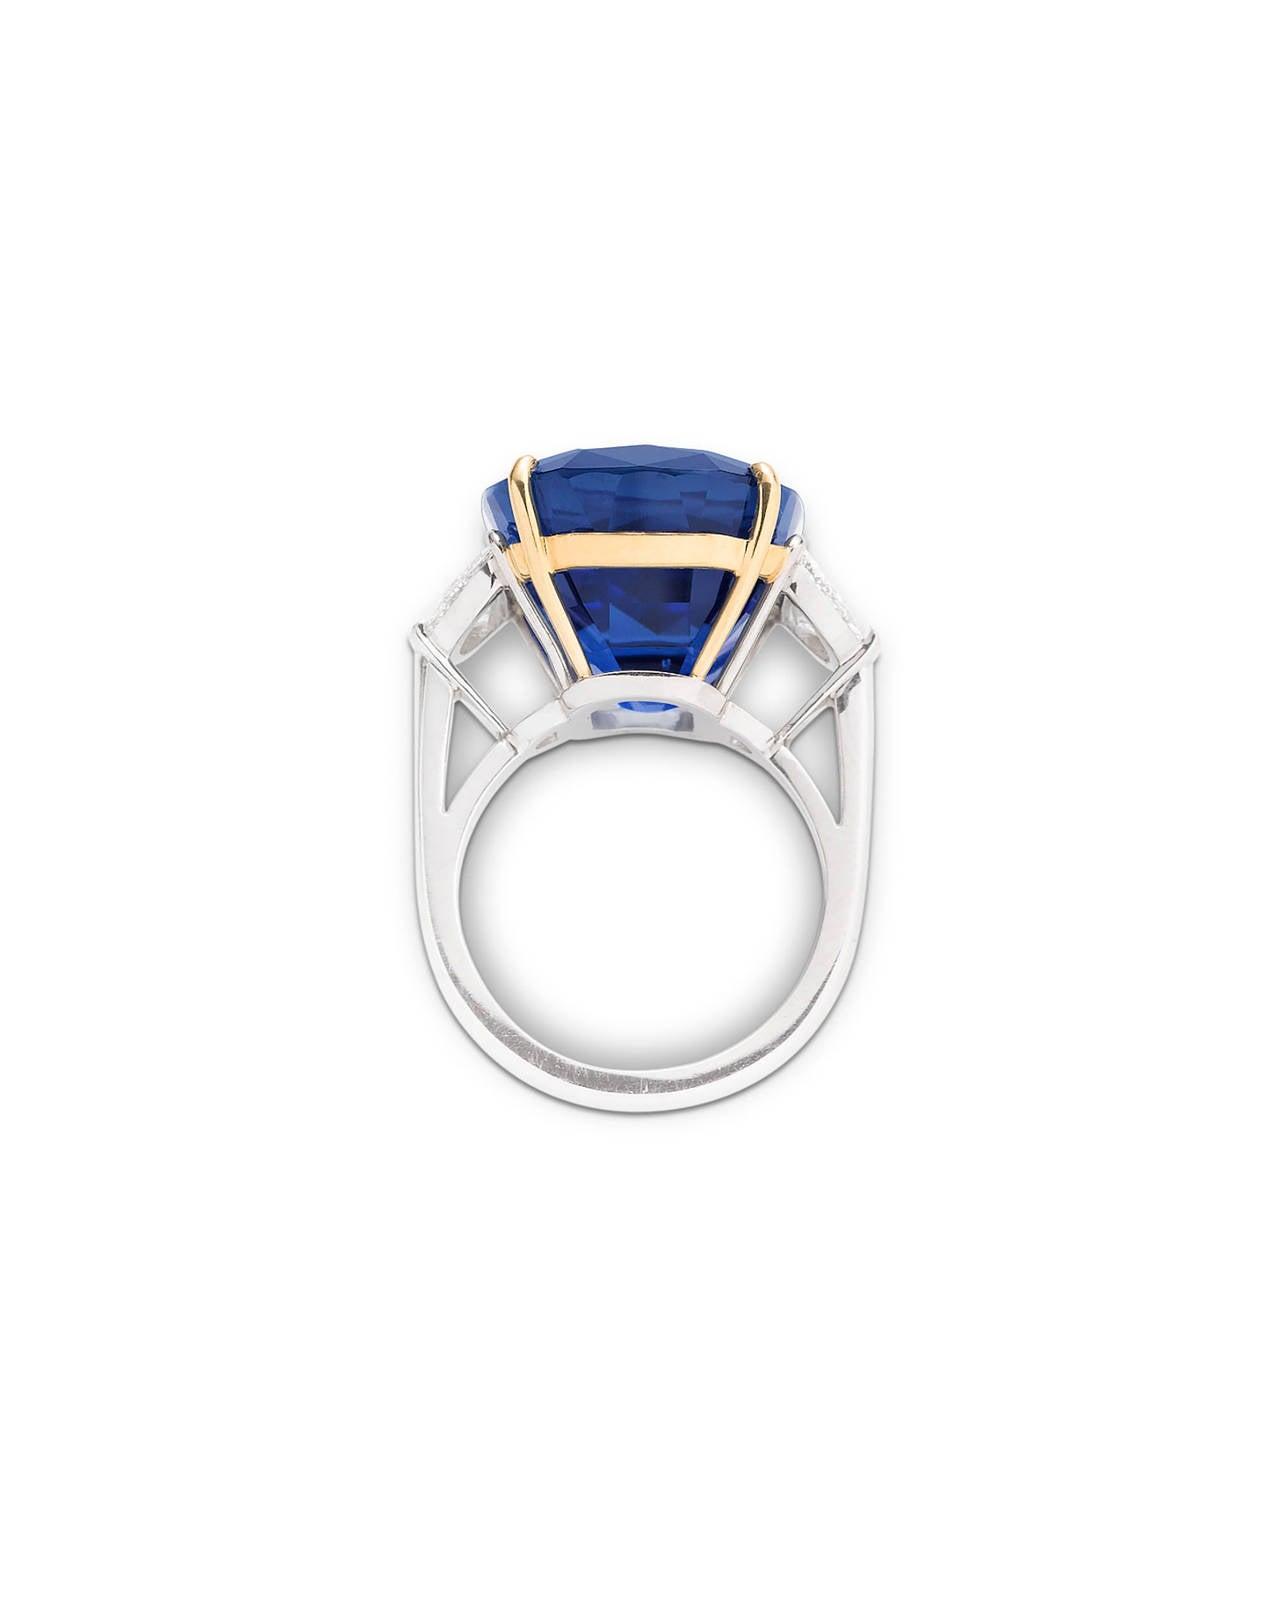 Untreated Burma Sapphire Ring 35.07 Carats 3